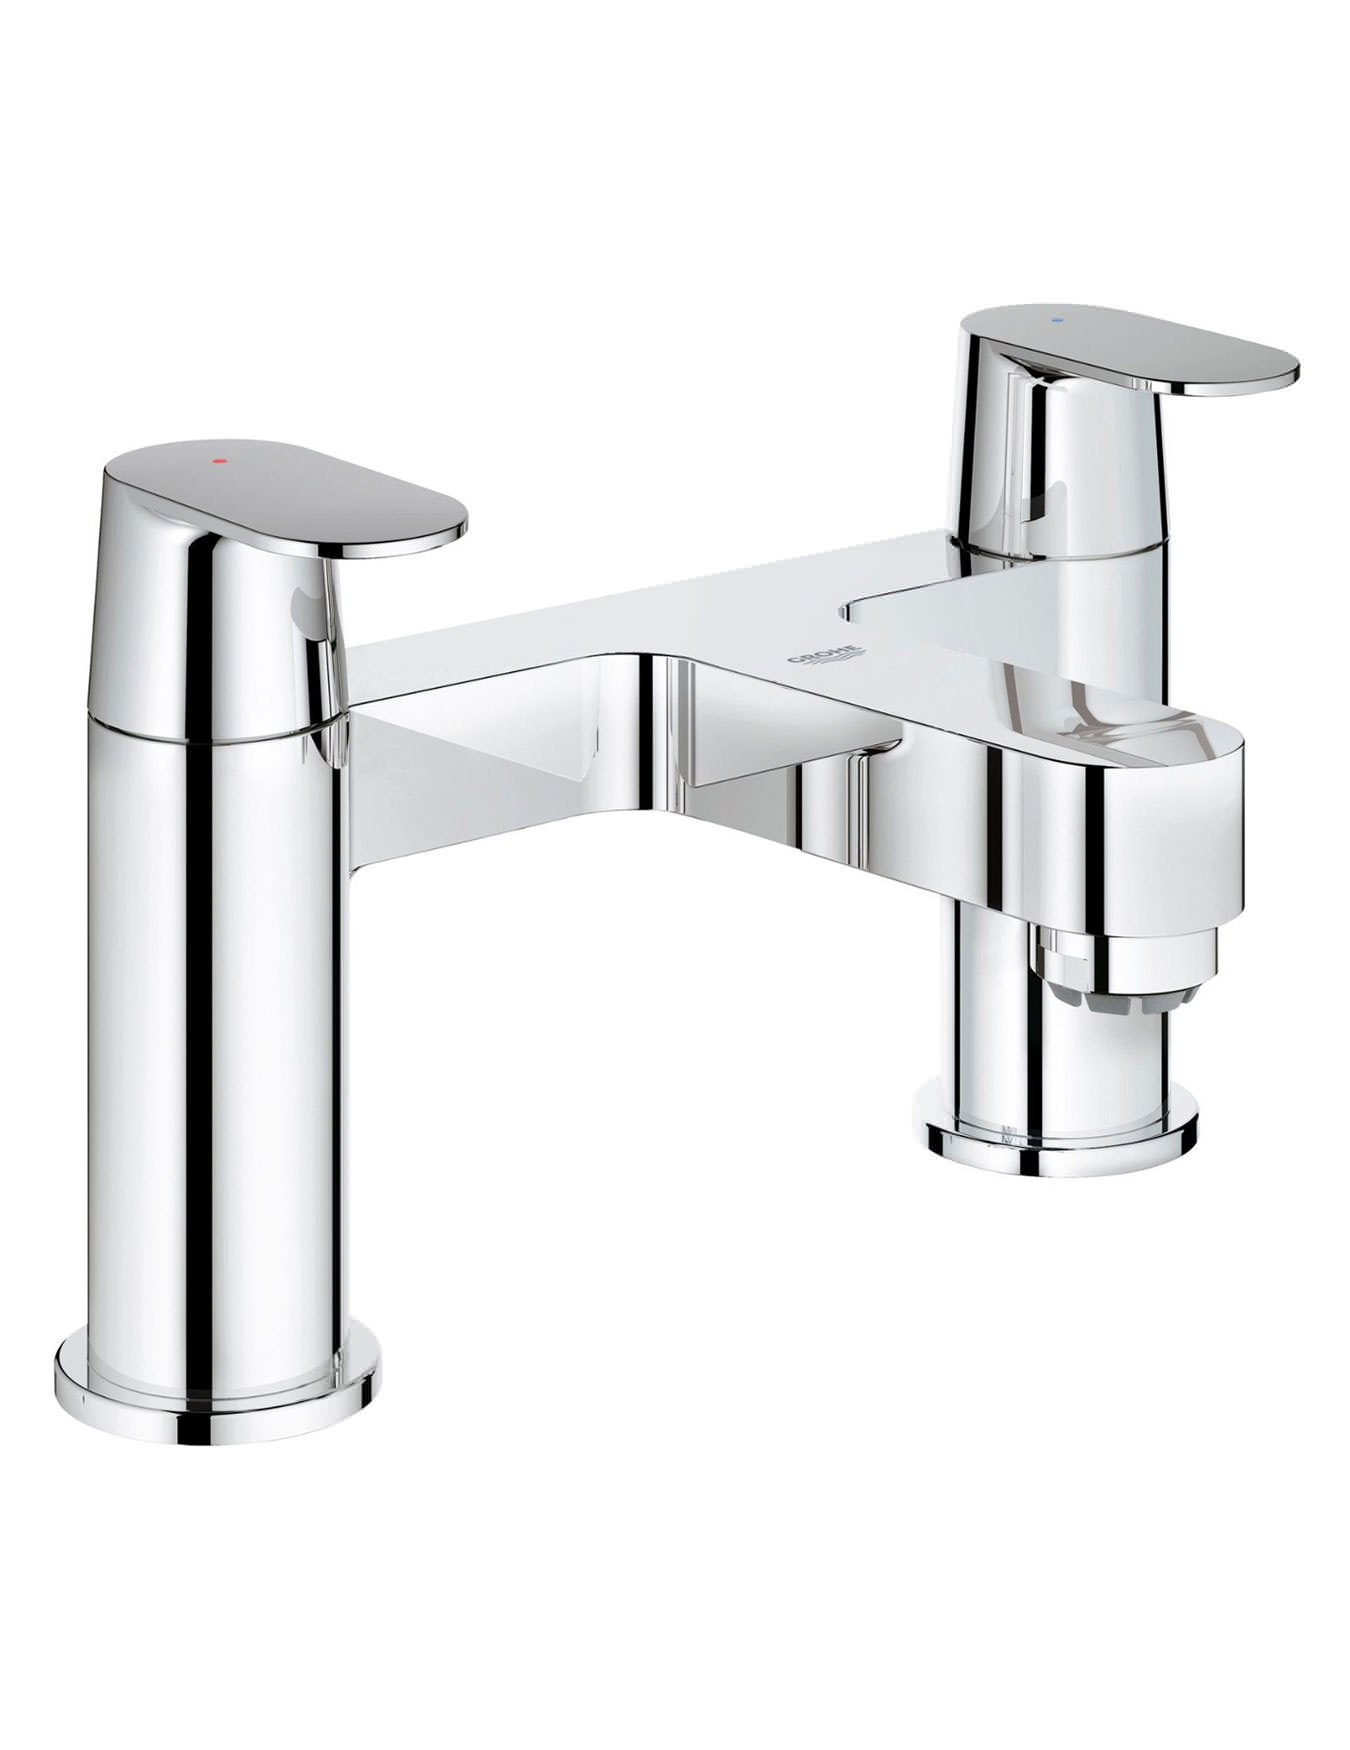 Grohe Eurosmart Cosmopolitan Deck Mounted Bath Filler Tap